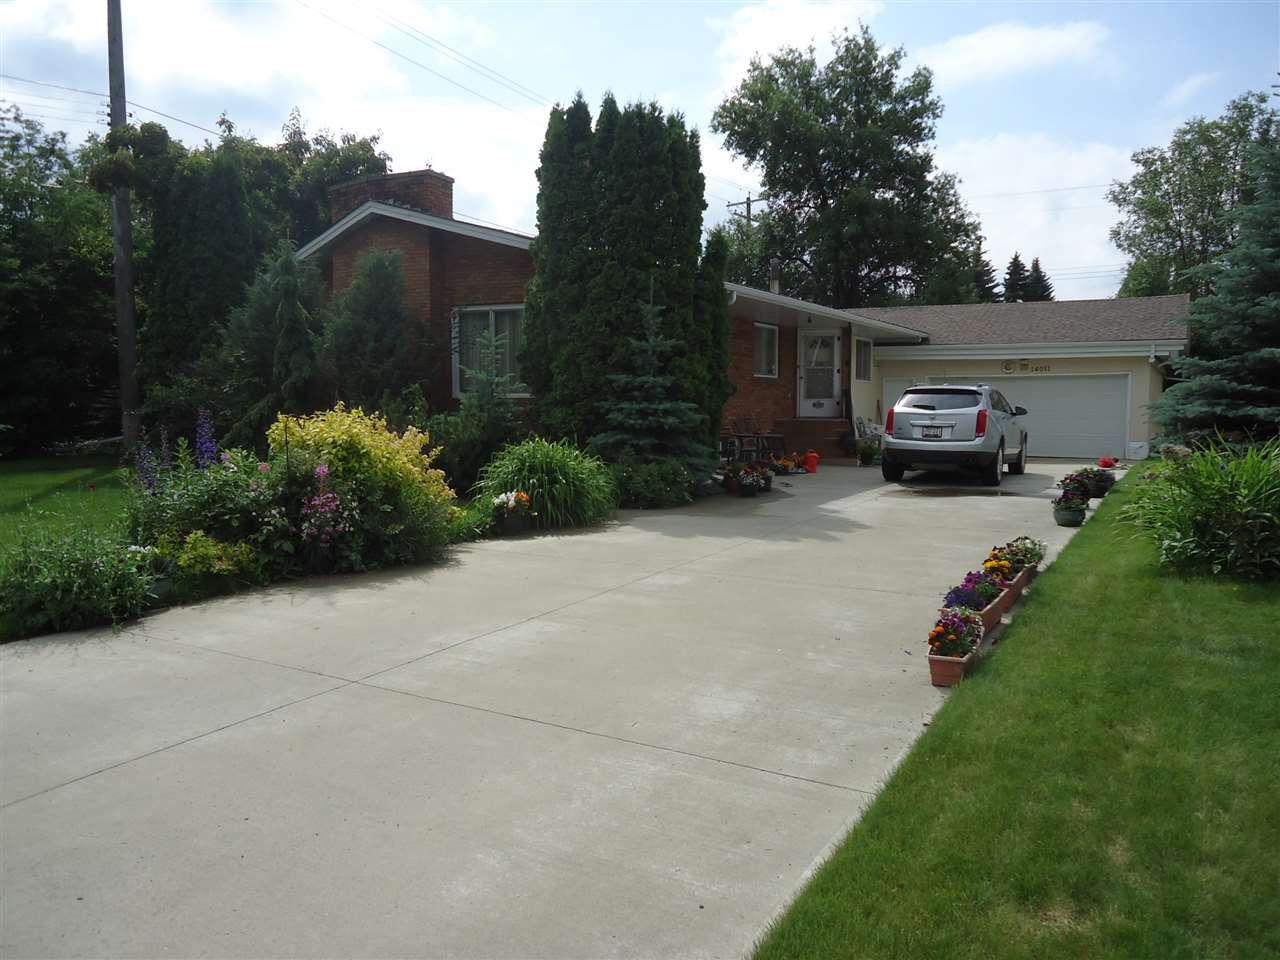 Main Photo: 14011 90 Avenue in Edmonton: Zone 10 House for sale : MLS®# E4164927